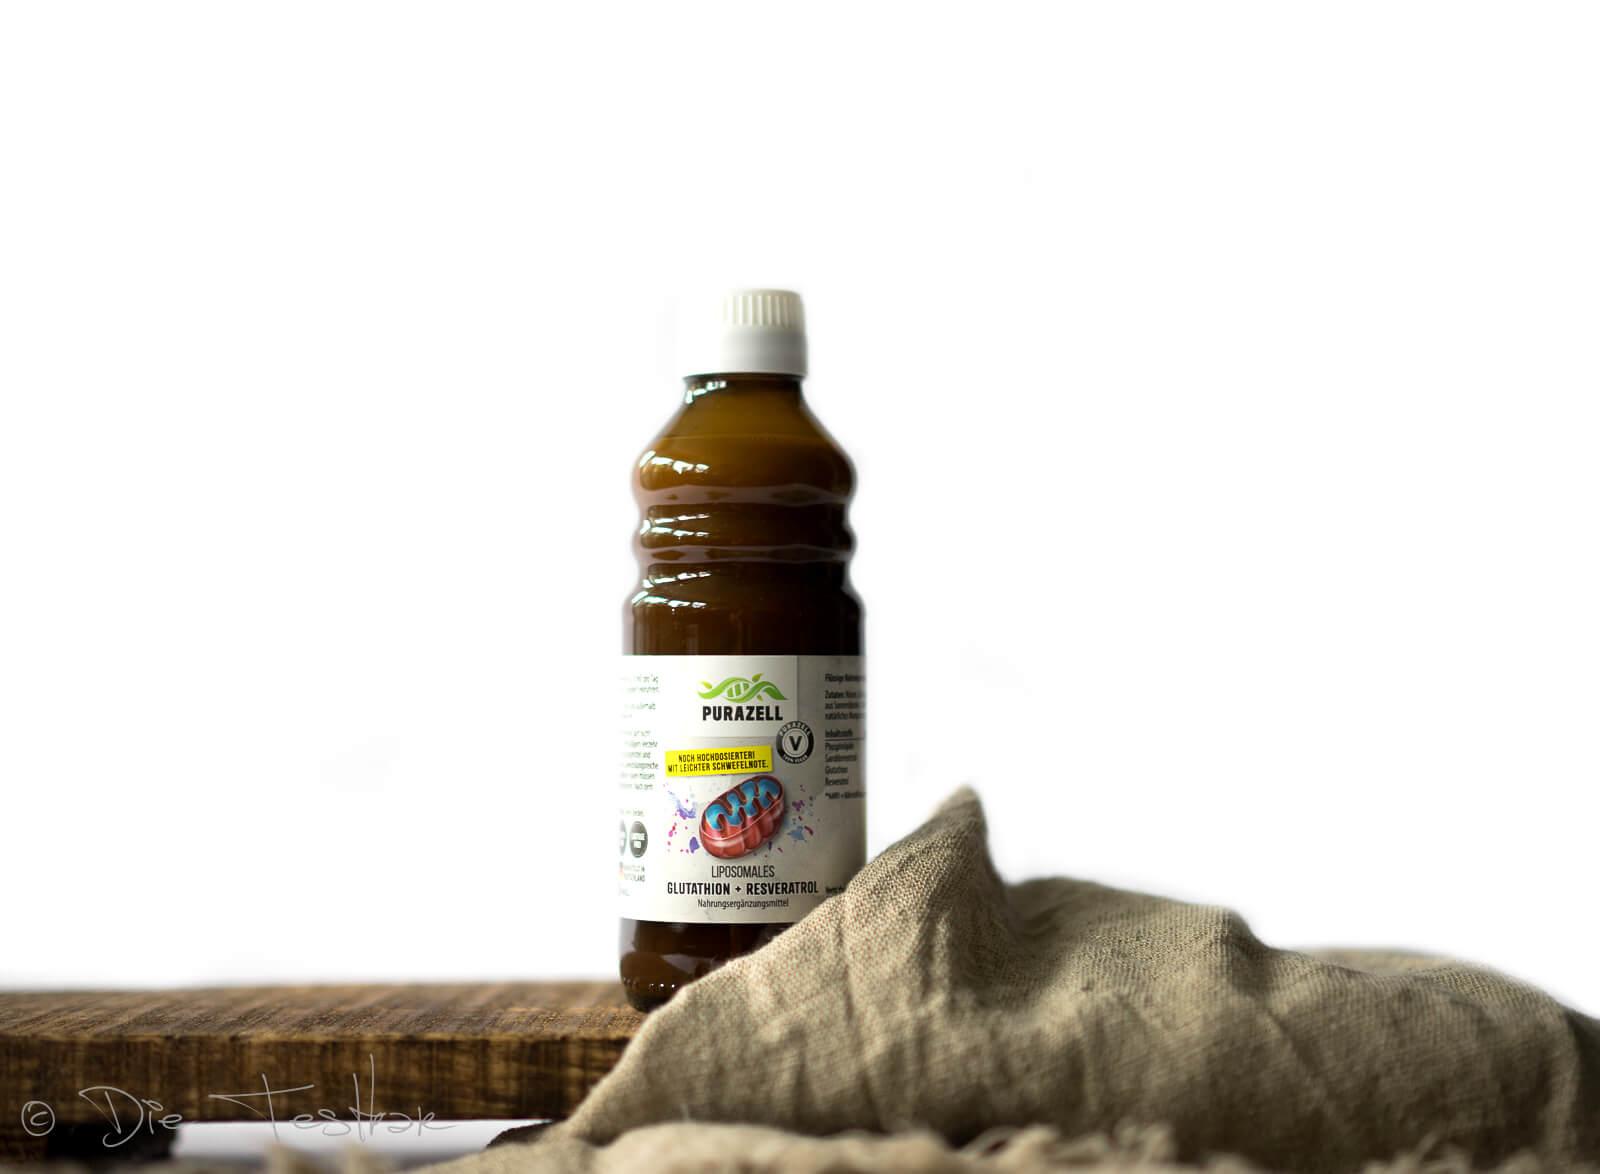 Liposomales Glutathion + Resveratrol vonPurazell